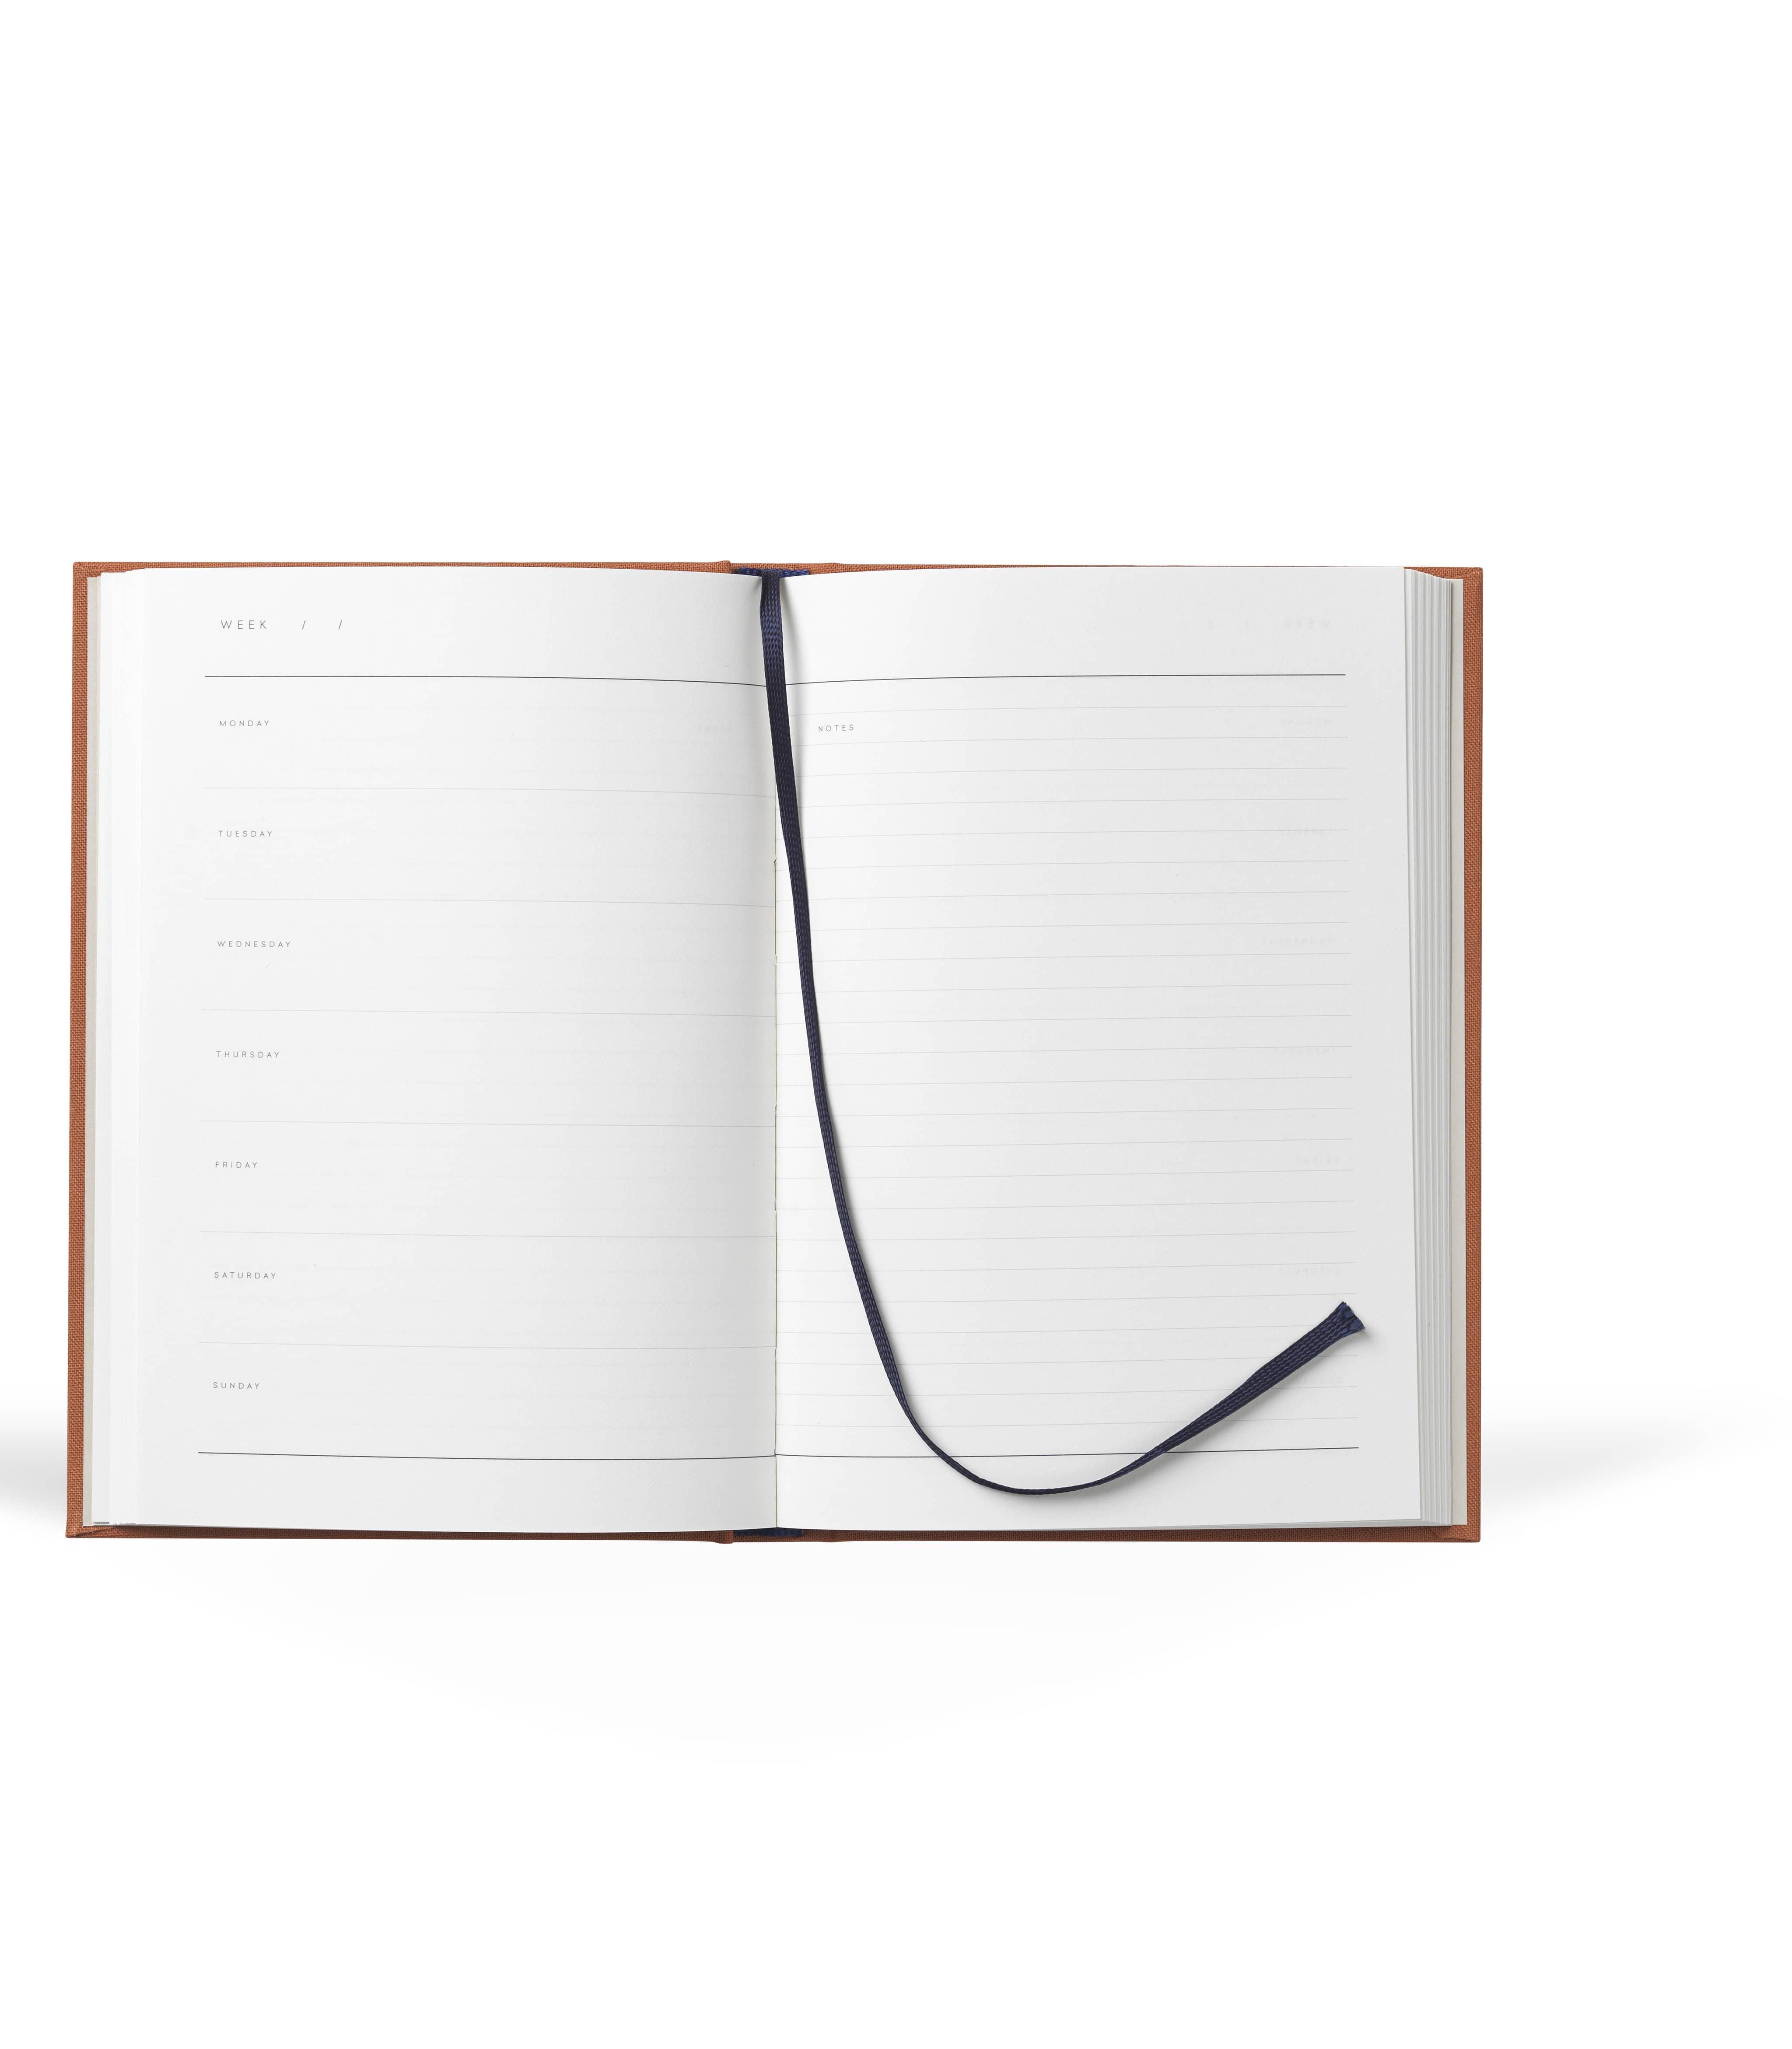 volta_notem_even_weekly-journal-sienna-cloth_inside_03